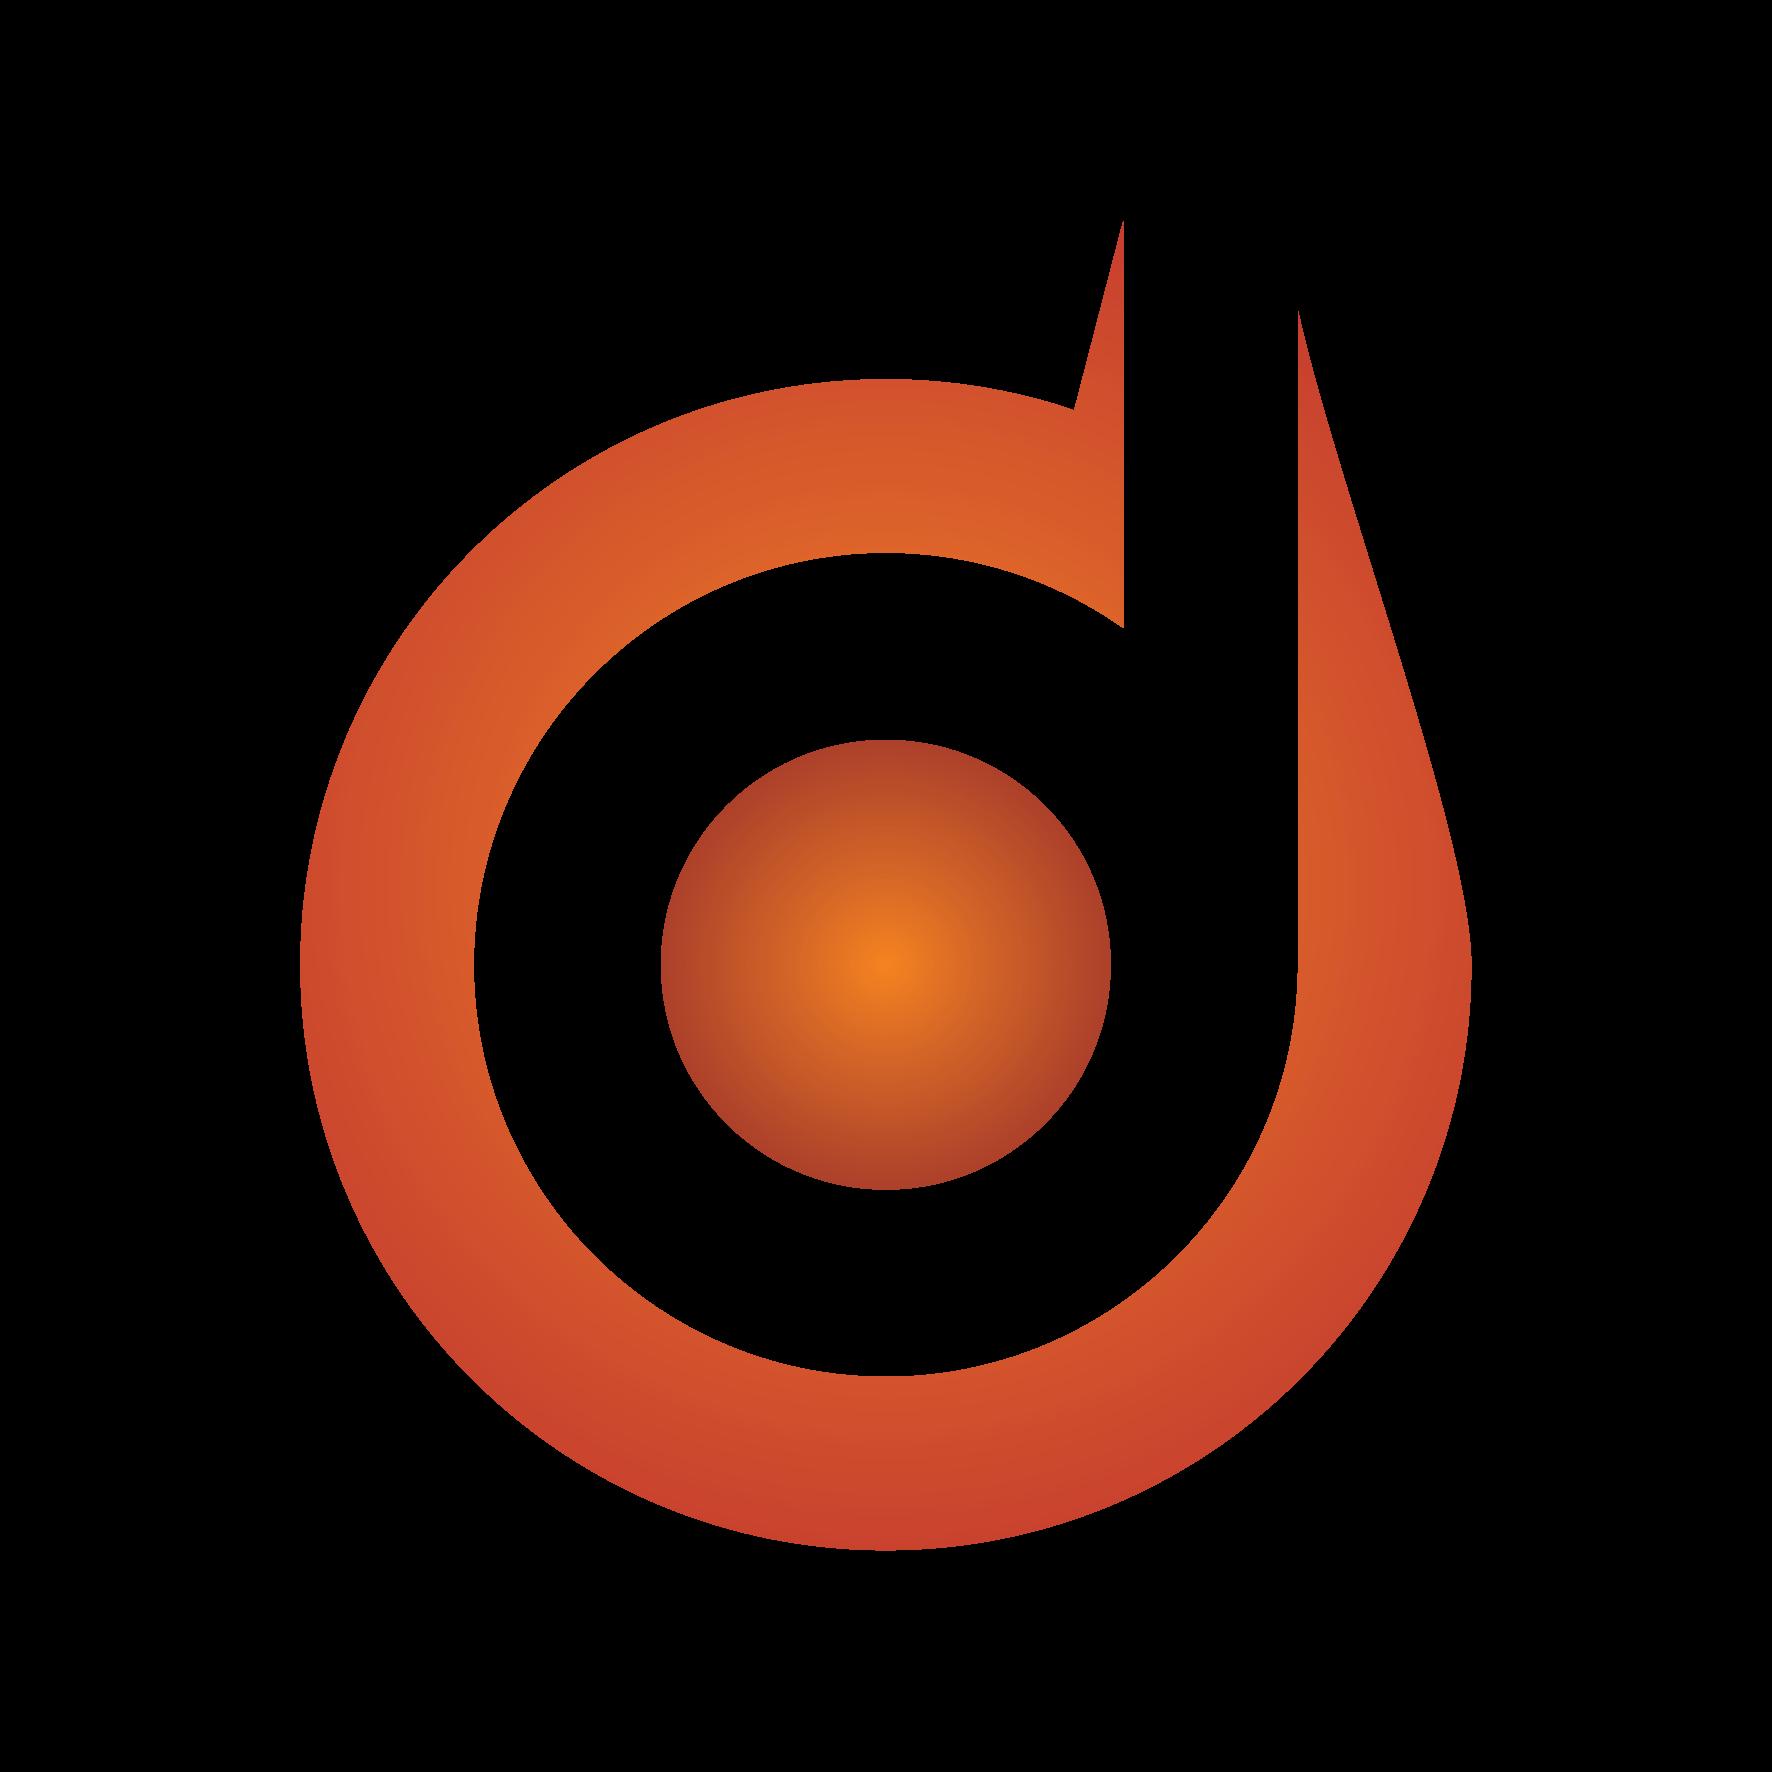 OkiDreams